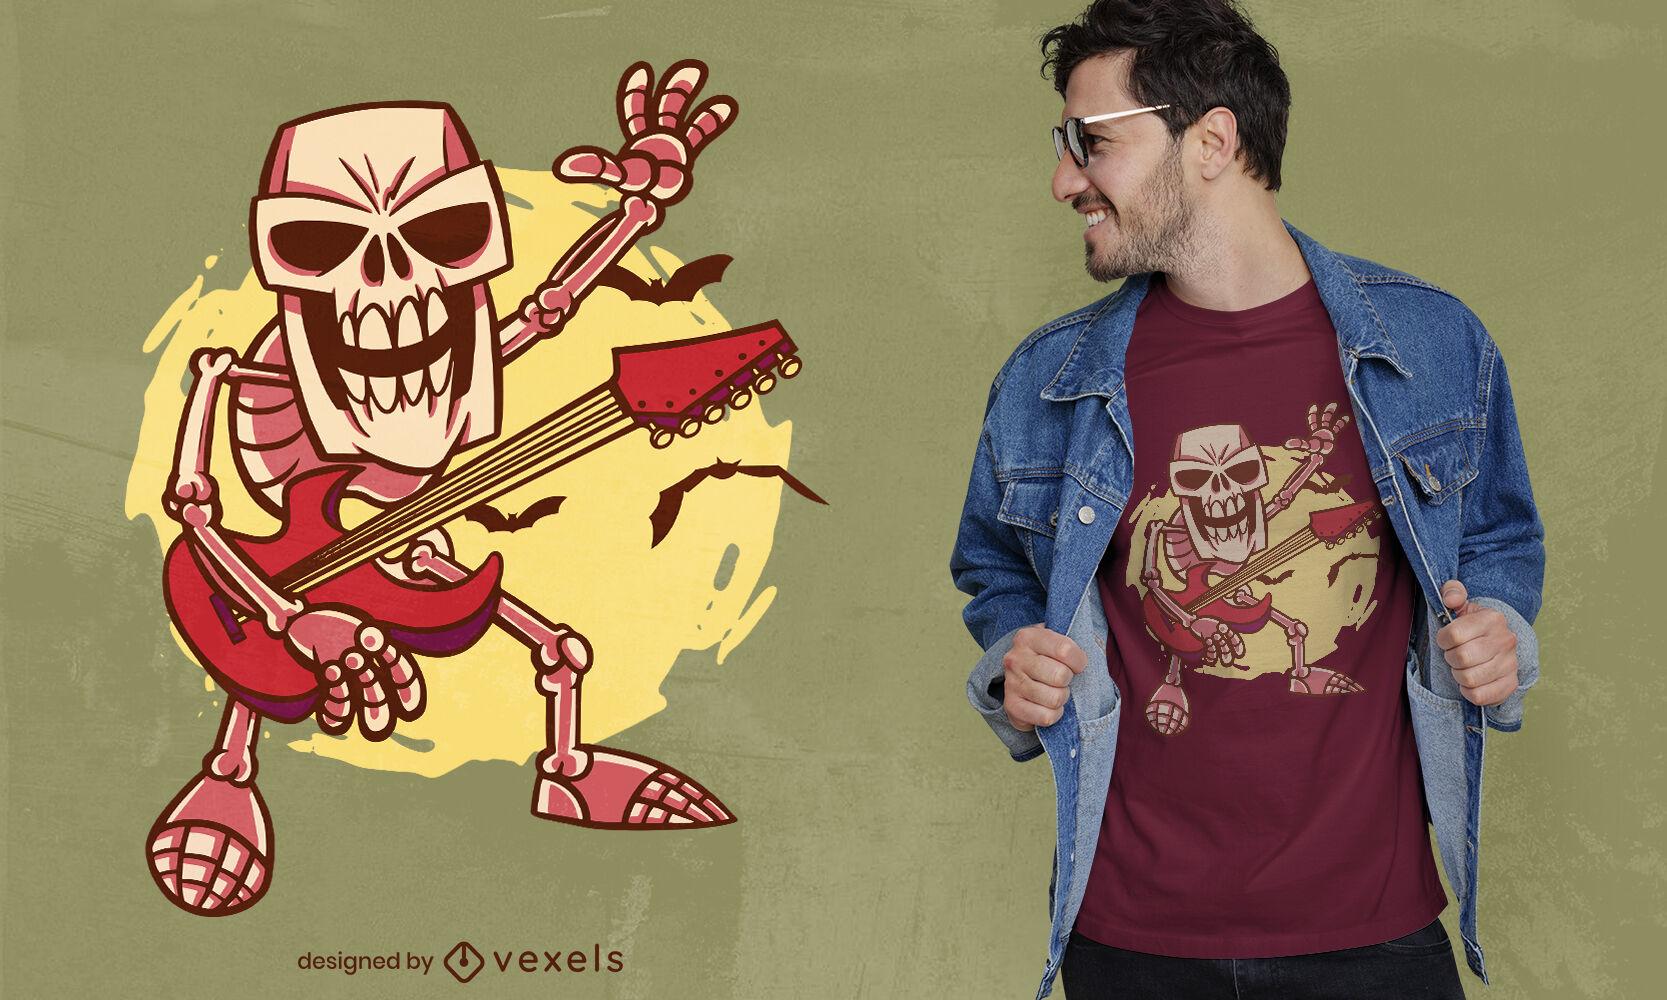 Dise?o de camiseta de dibujos animados de esqueleto de guitarra de rock